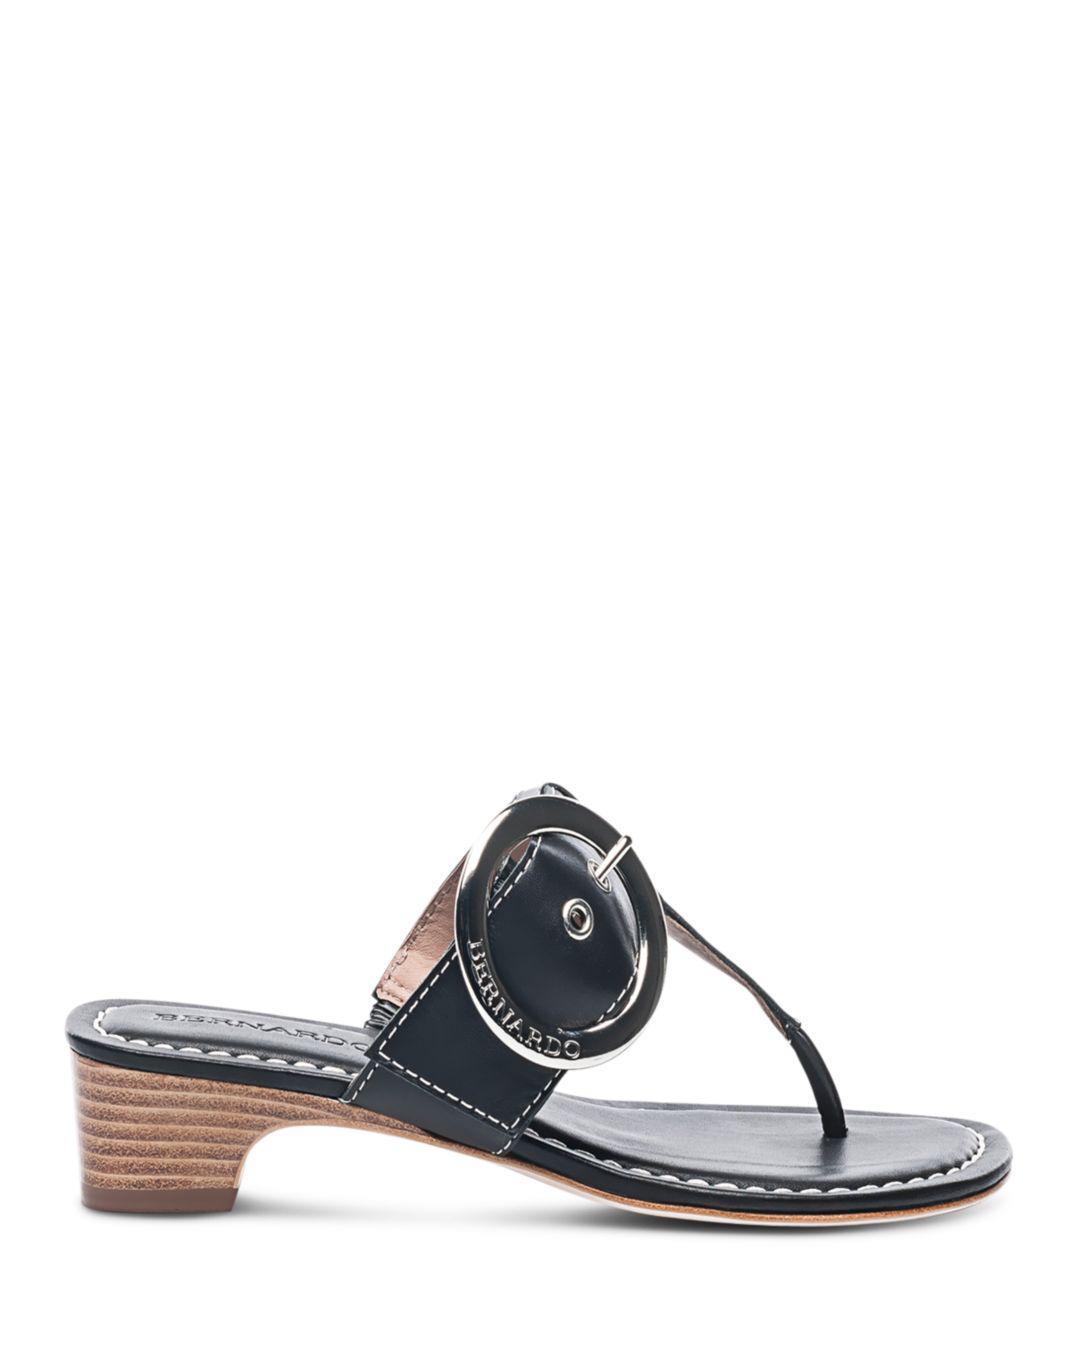 beab102f9be11a Lyst - Bernardo Women s Leather Buckle Block Heel Thong Sandals in Black